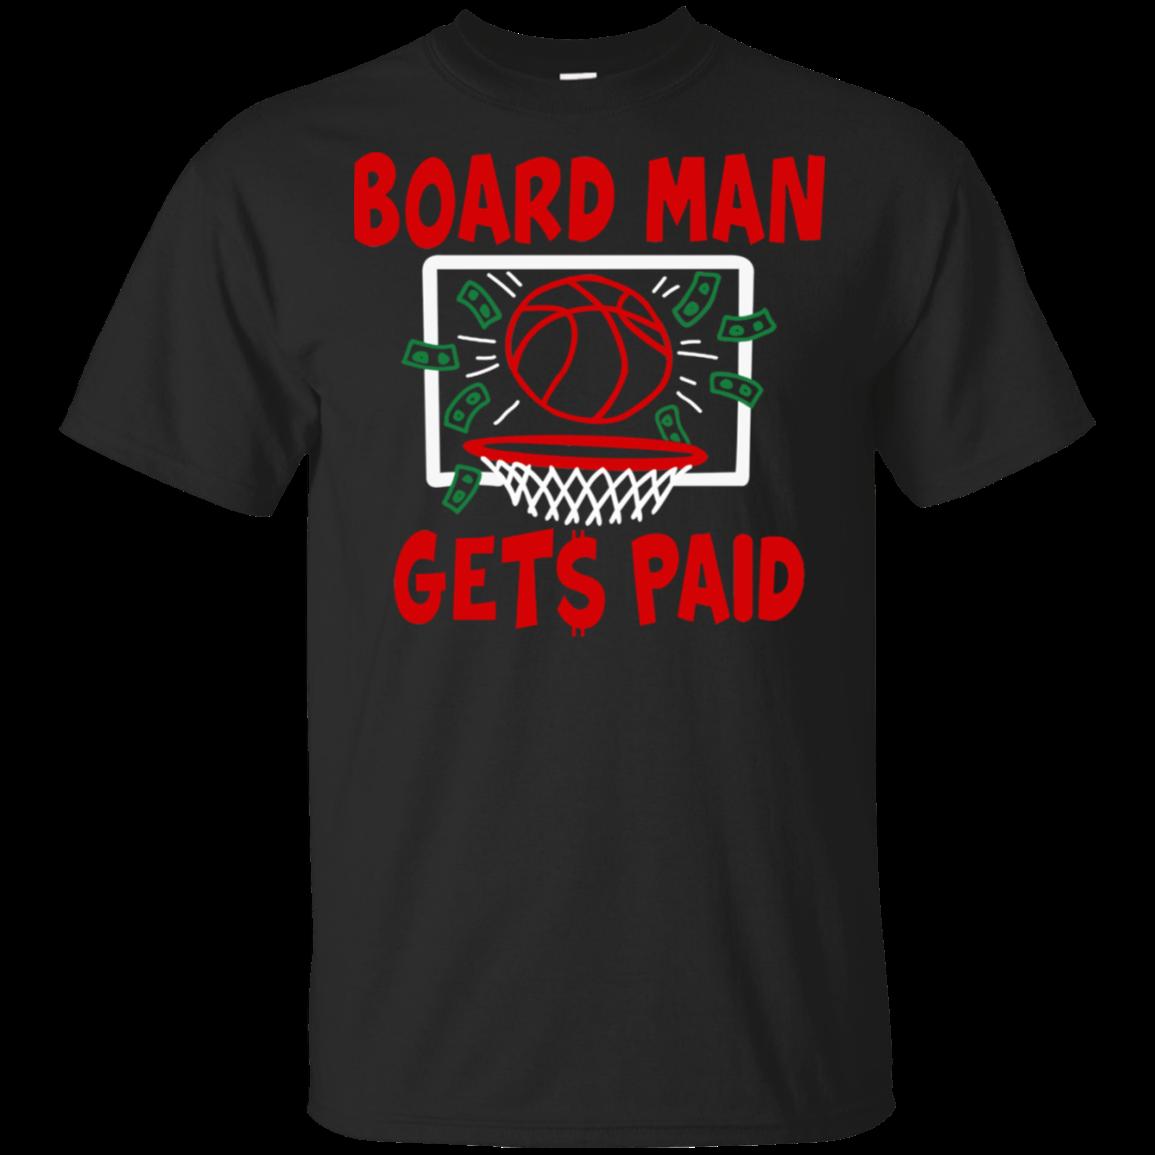 GT-SHIRT Toronto camiseta Raptors hombre obtiene pagado camiseta Kawhi Leonard camisa S-3XL